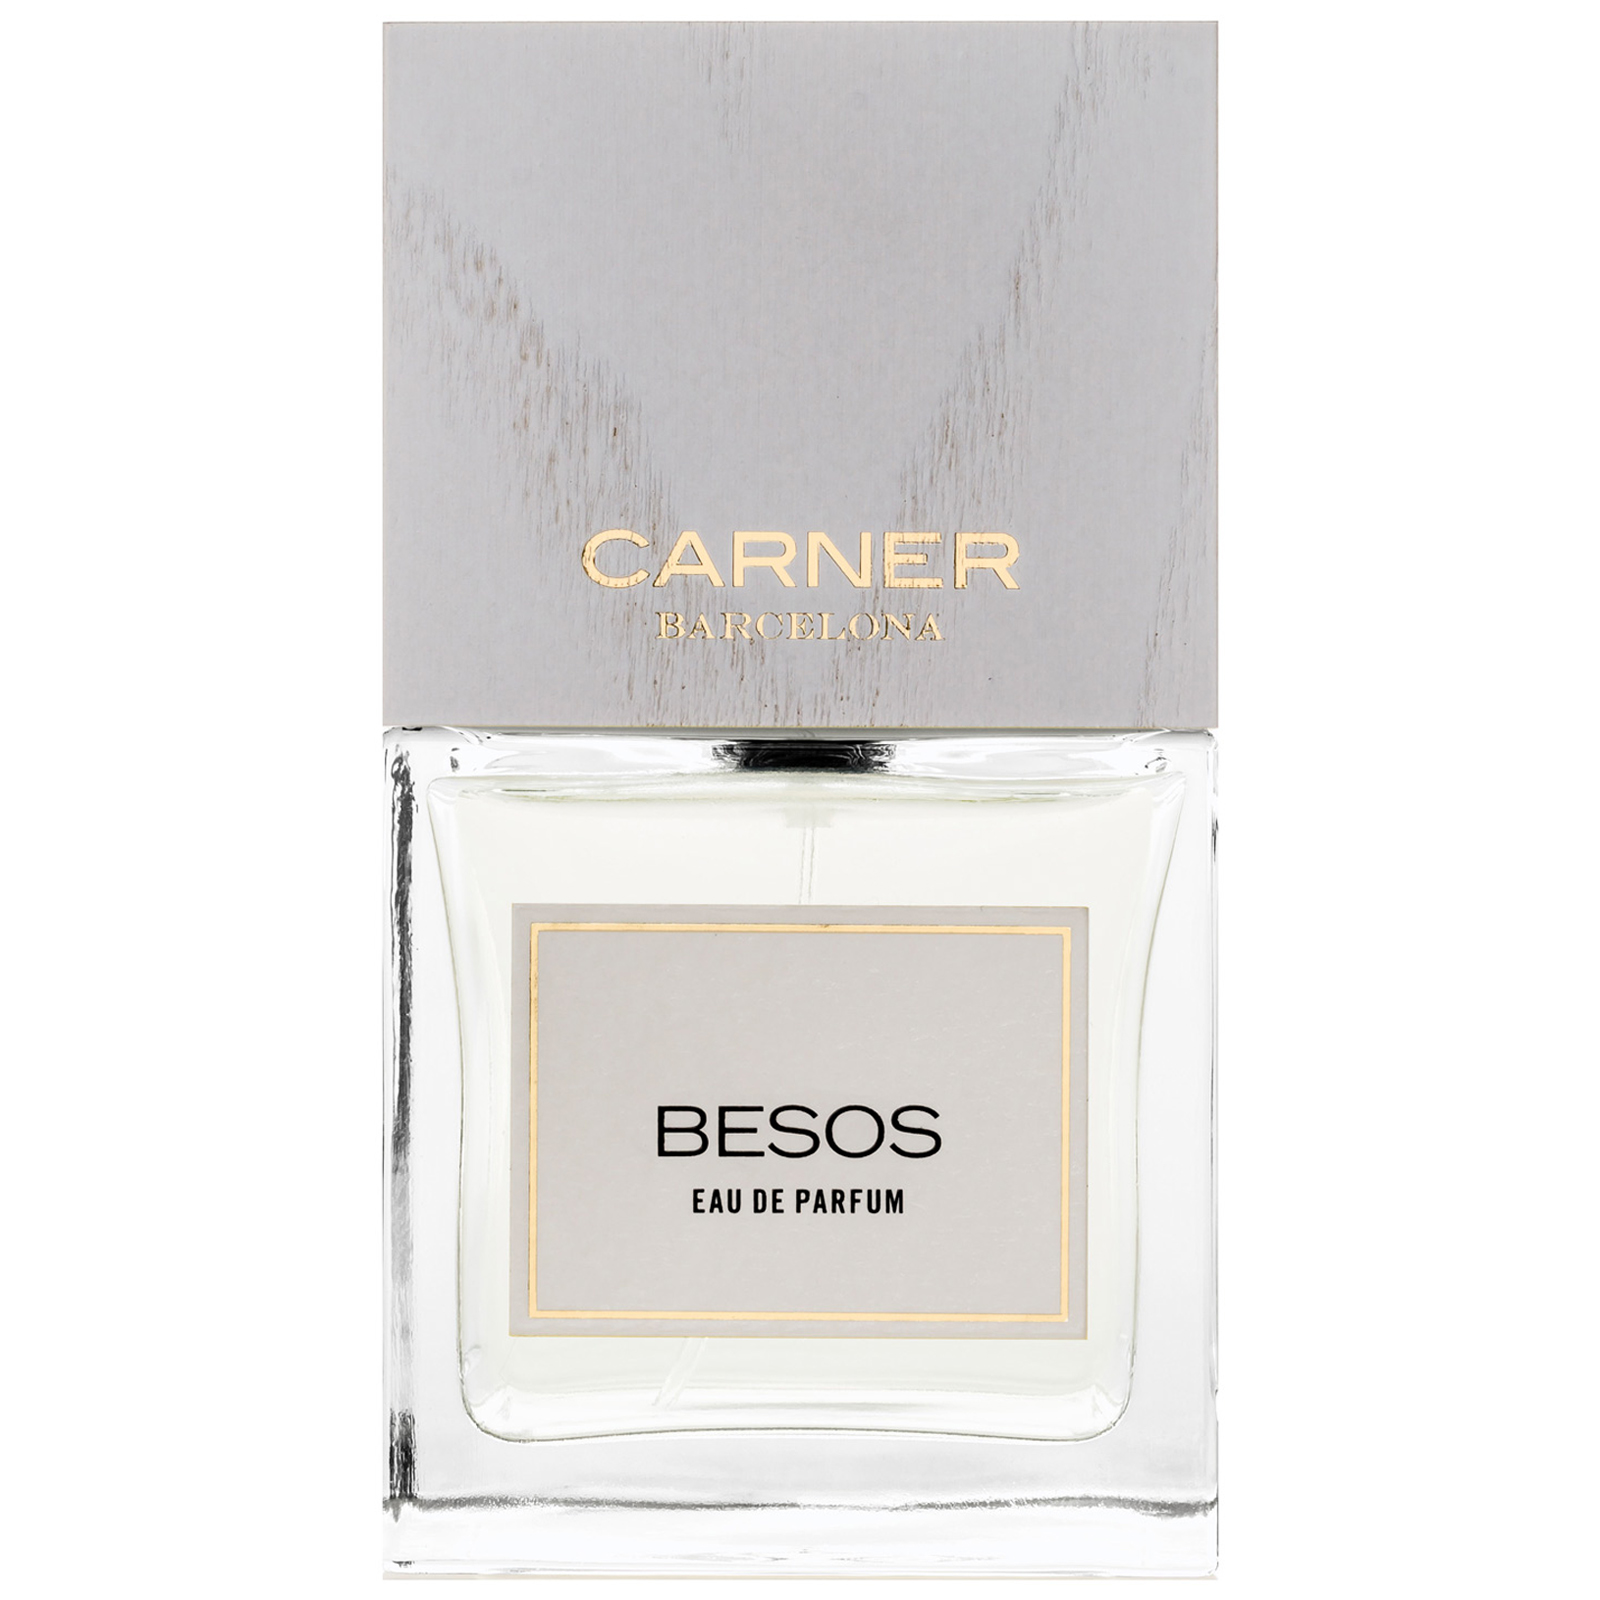 Besos profumo eau de parfum 100 ml